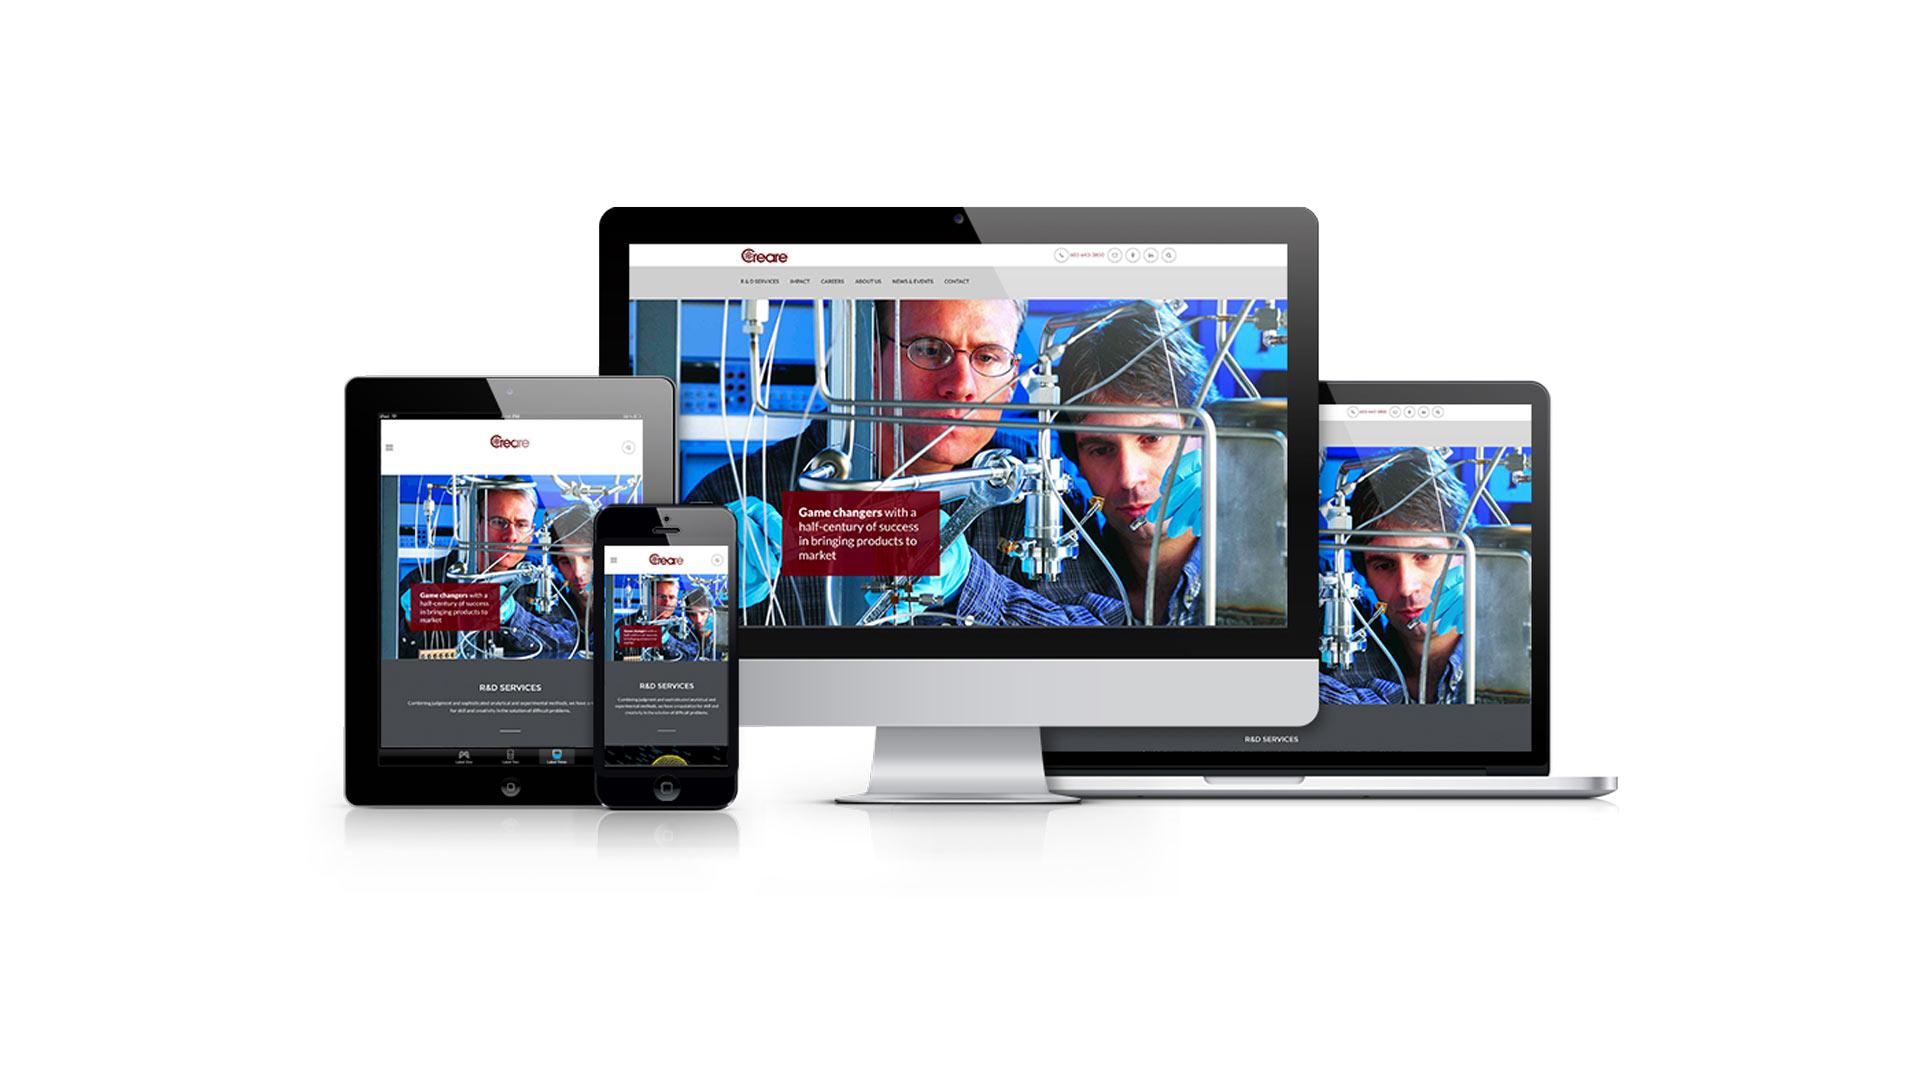 iPad, iPhone, iMac, and Macbook displaying the Creare homepage